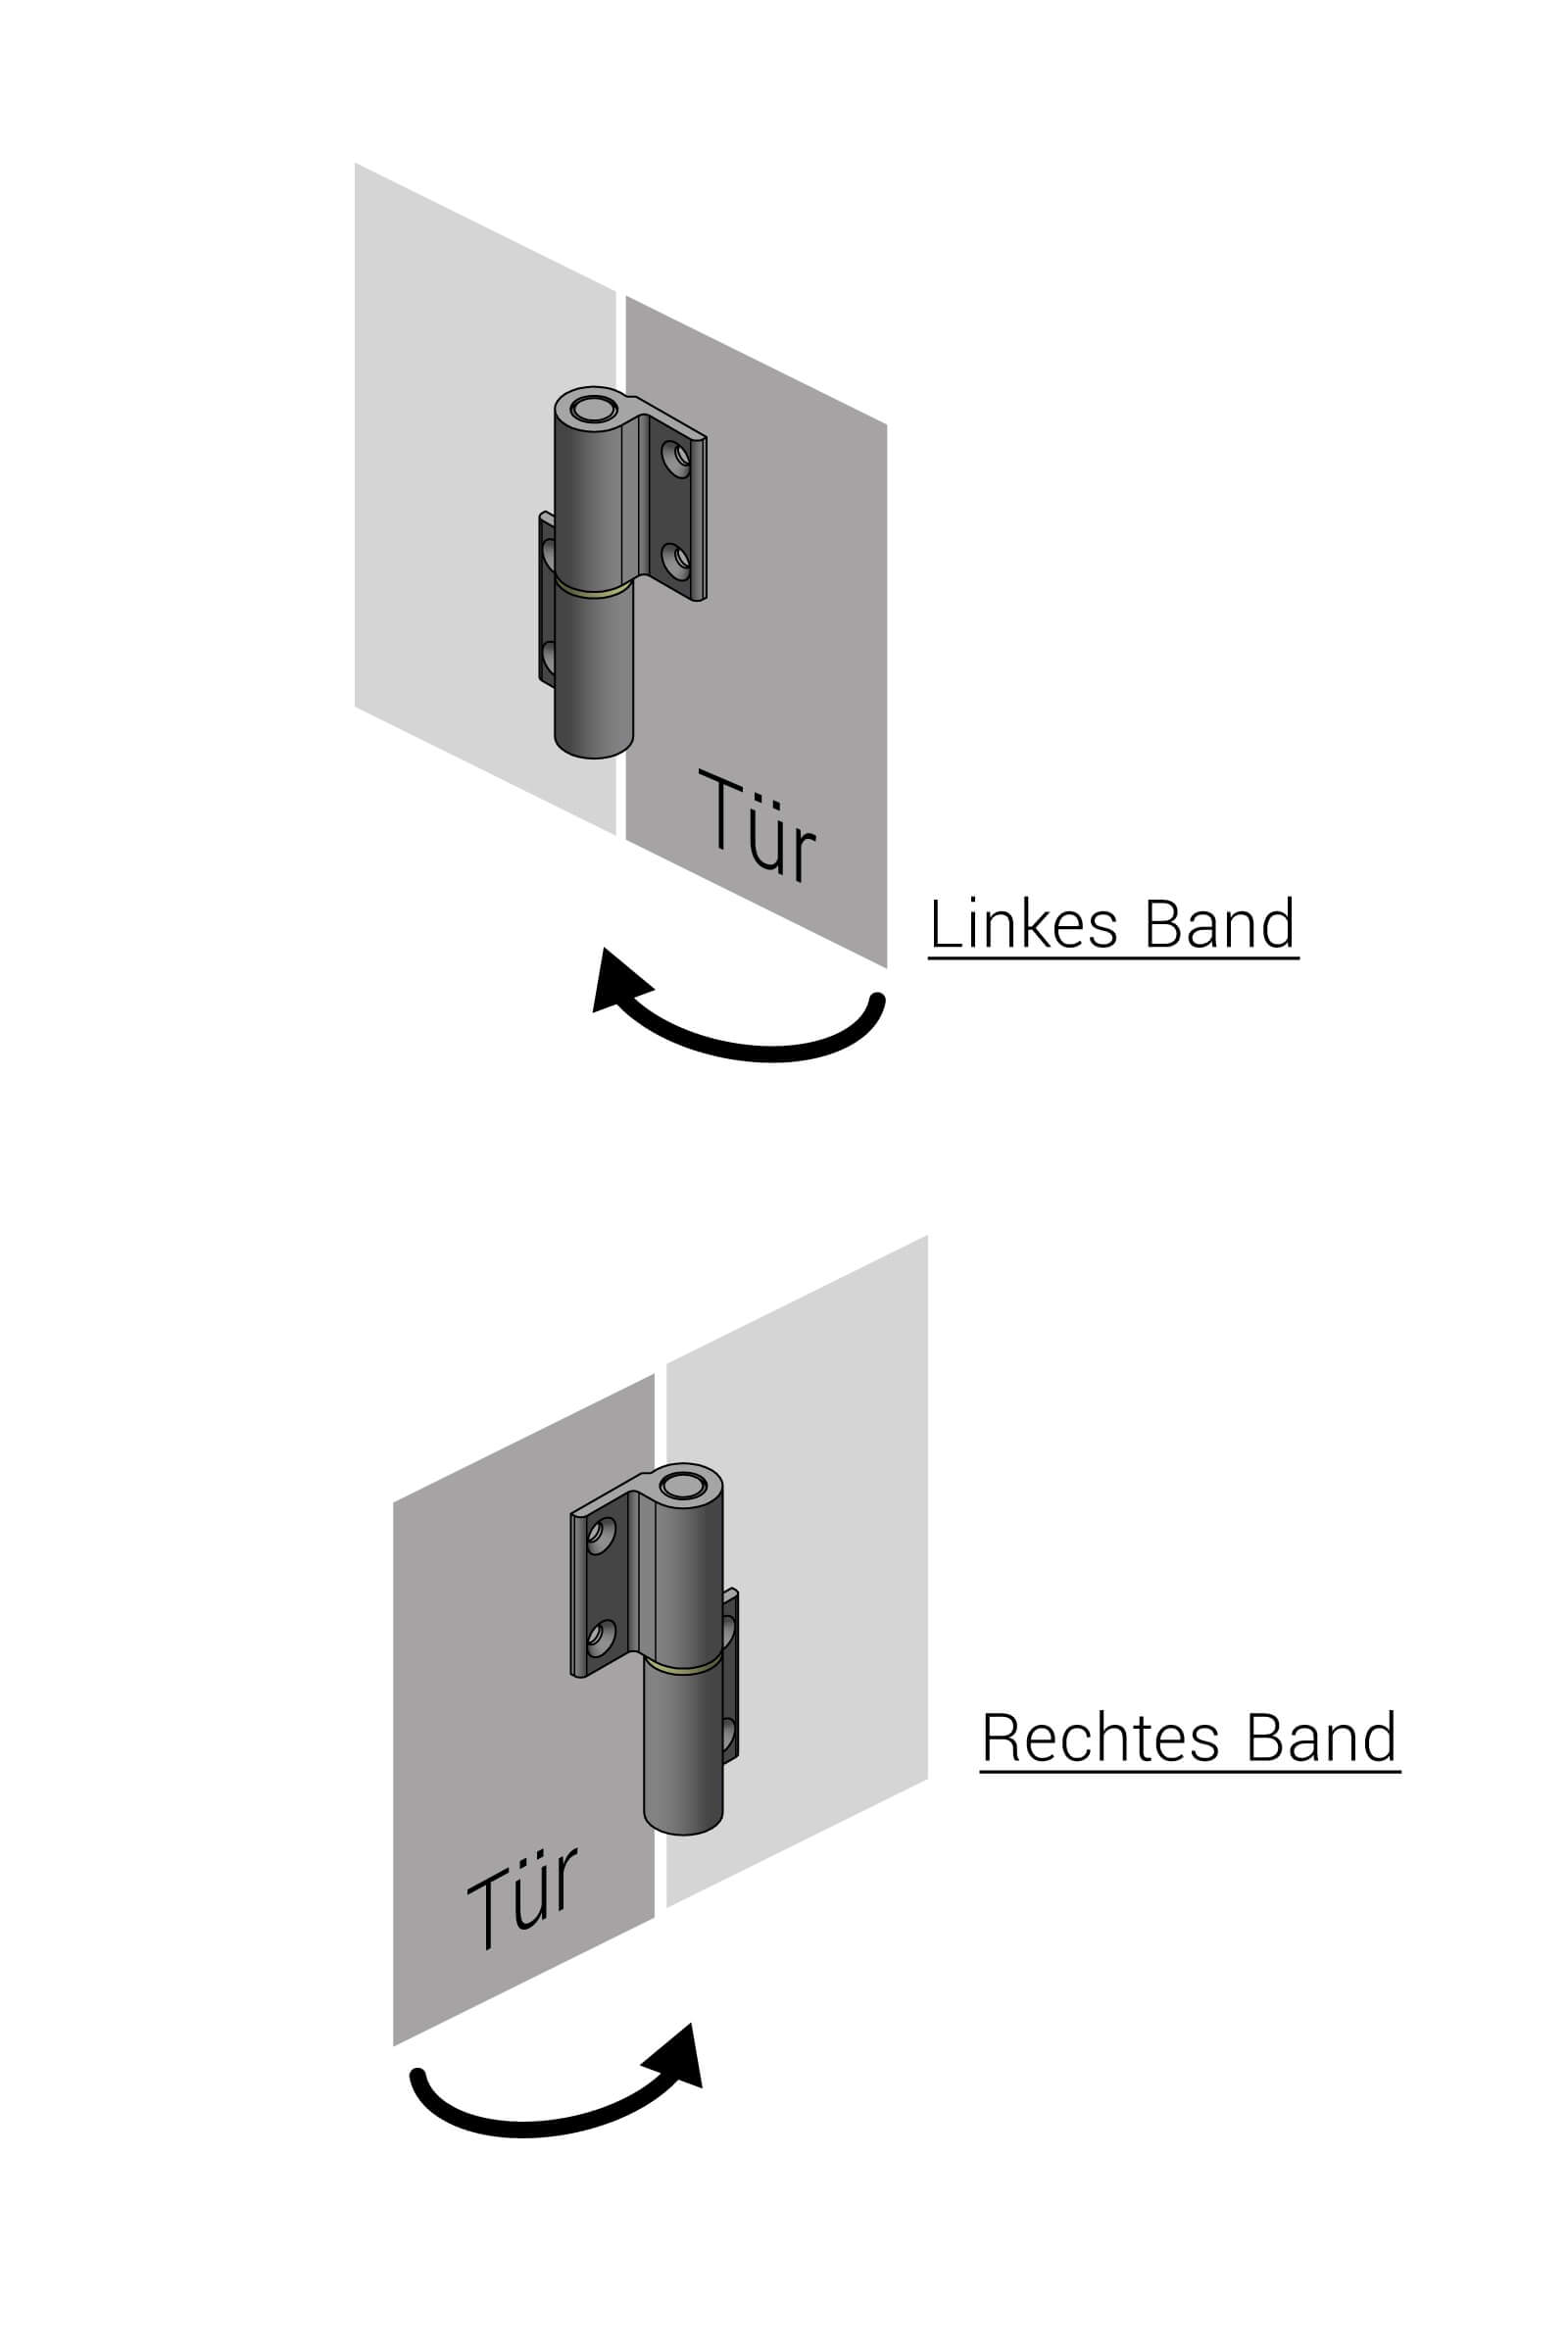 BUNT & PFIFFIG Doppelpack Möbelband Möbelscharnier Aufschraubband Türscharnier aus Aluminium Grau Achatgrau Hellgrau RAL 7038 DIN-Richtung: Links - aufschraubbar-3